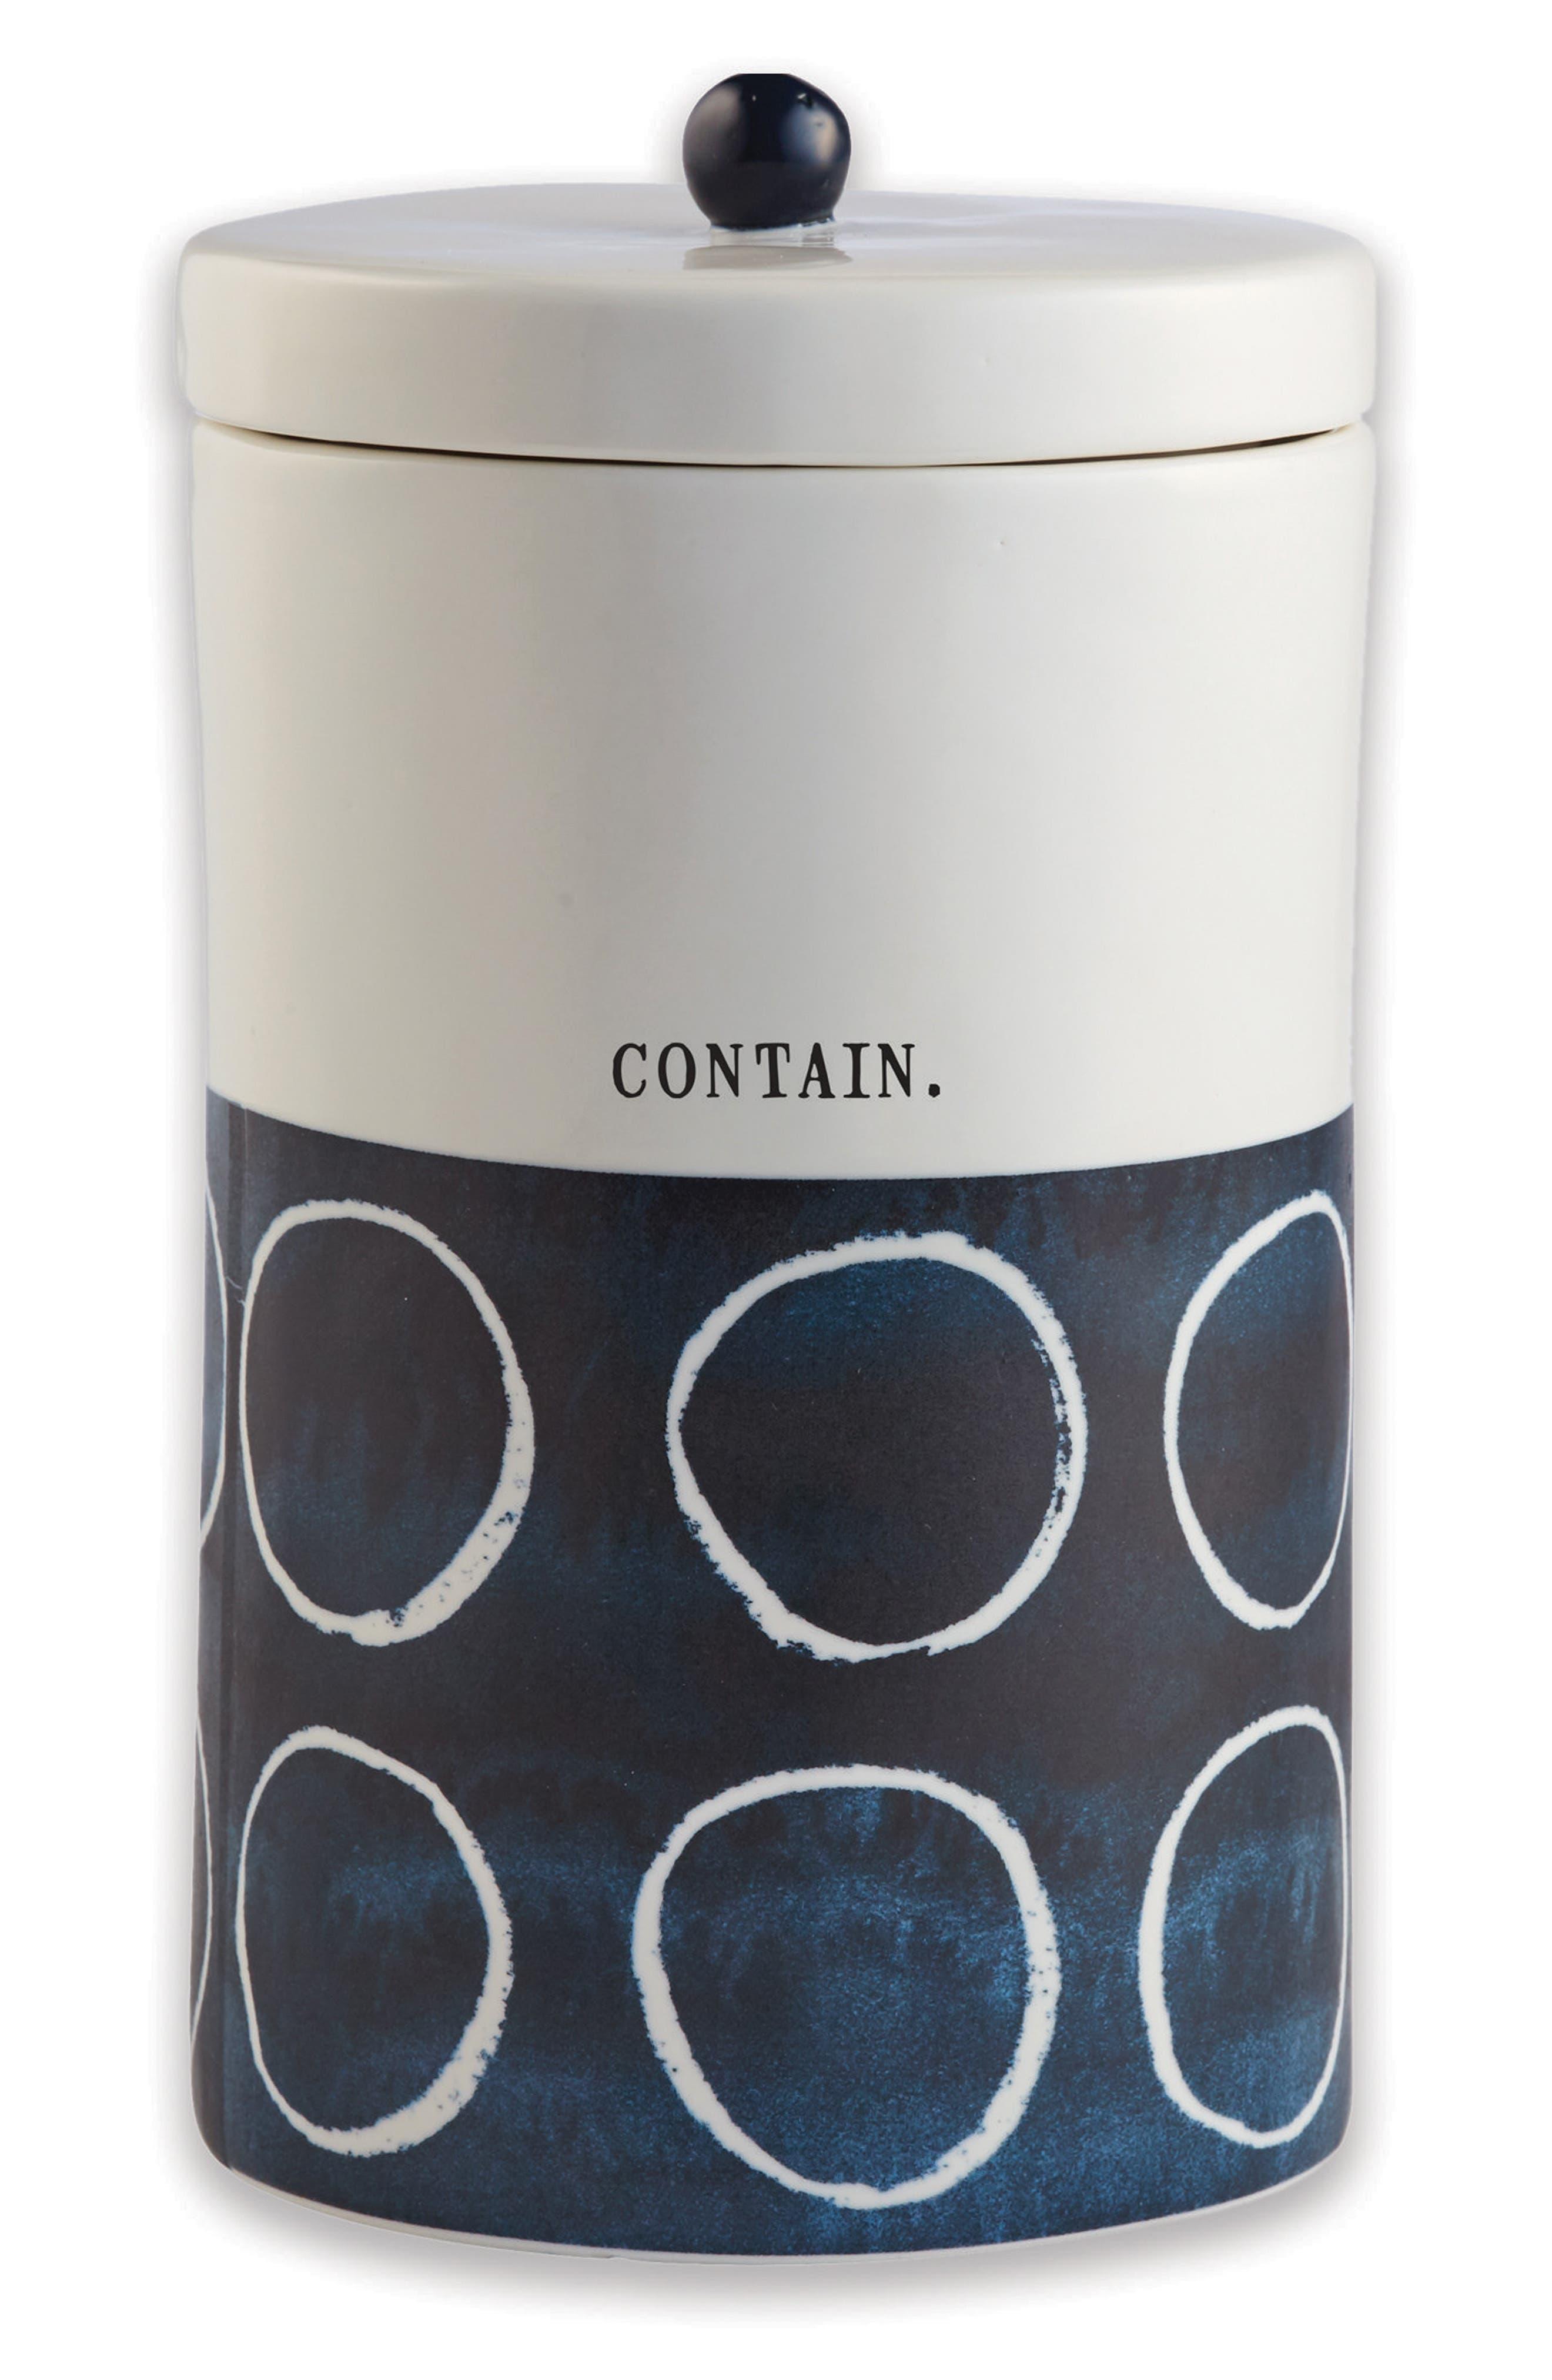 Rae Dunn Large Ceramic Canister